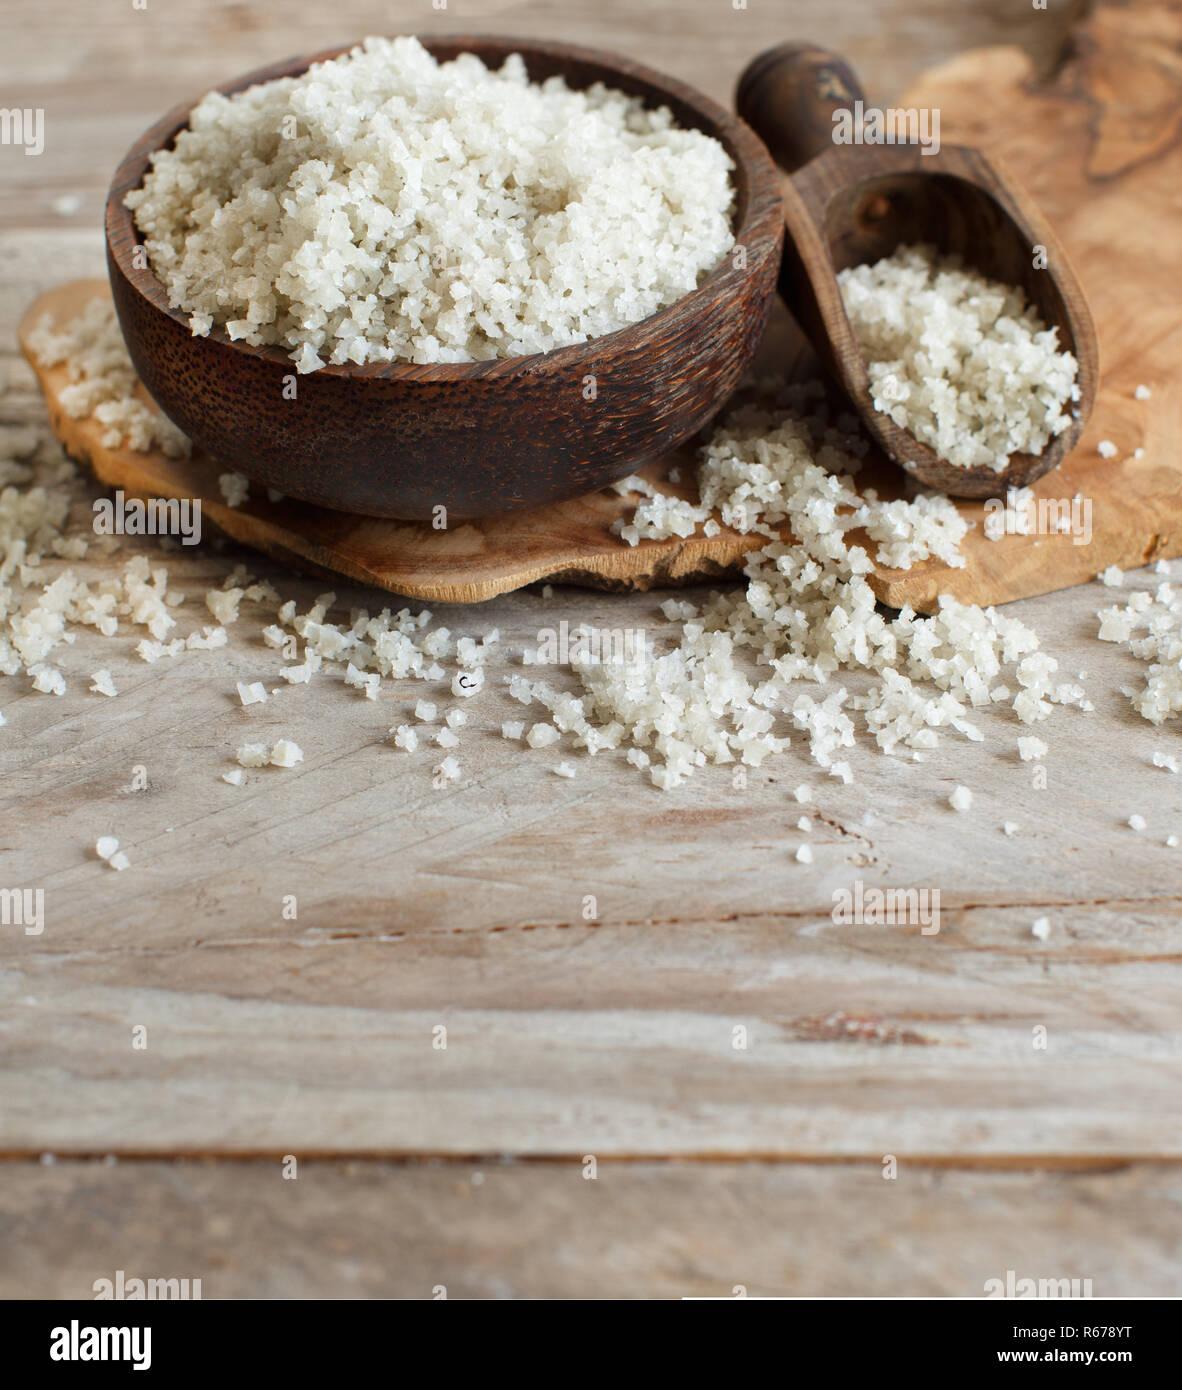 Celtic Grey Sea Salt from France Stock Photo: 227583436 - Alamy